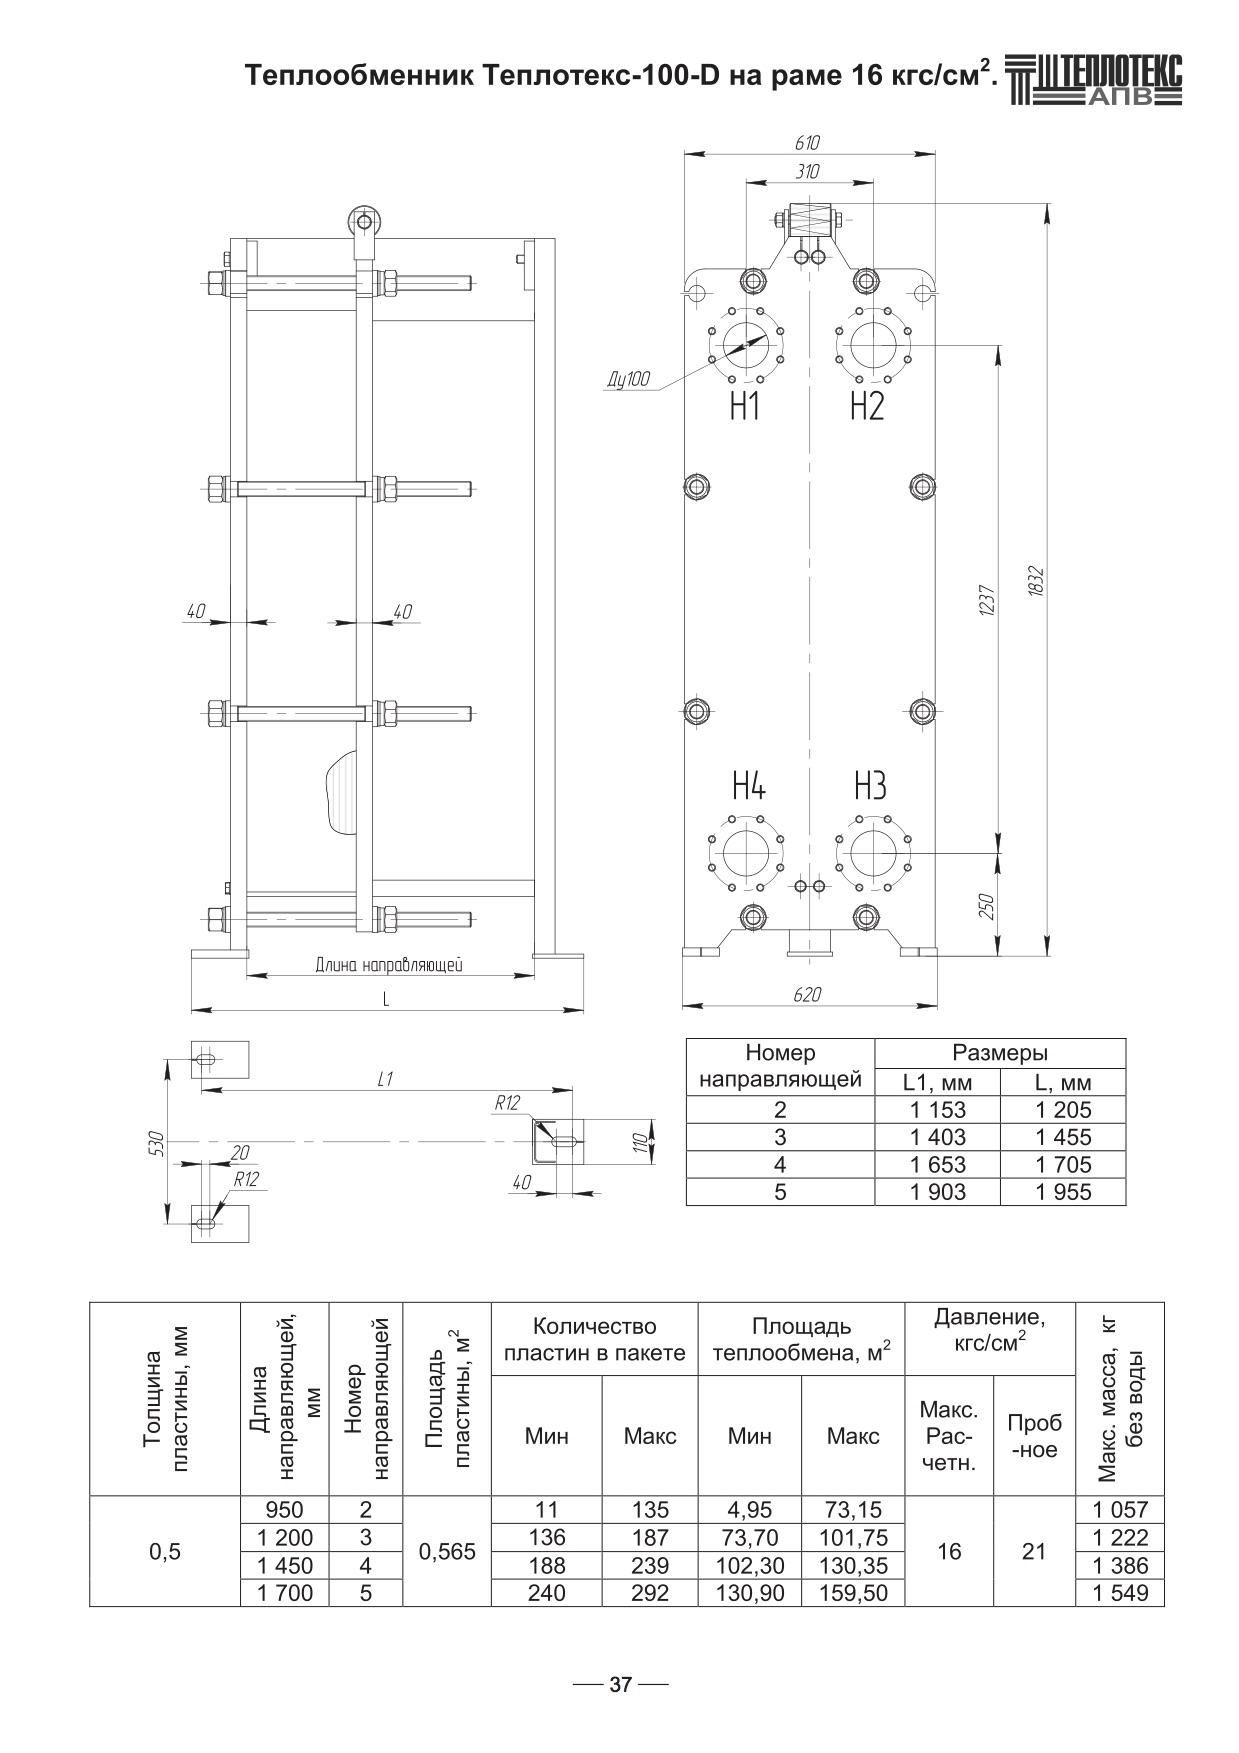 Уплотнения теплообменника Теплотекс 80B Артём Уплотнения теплообменника Sondex SF131 Улан-Удэ